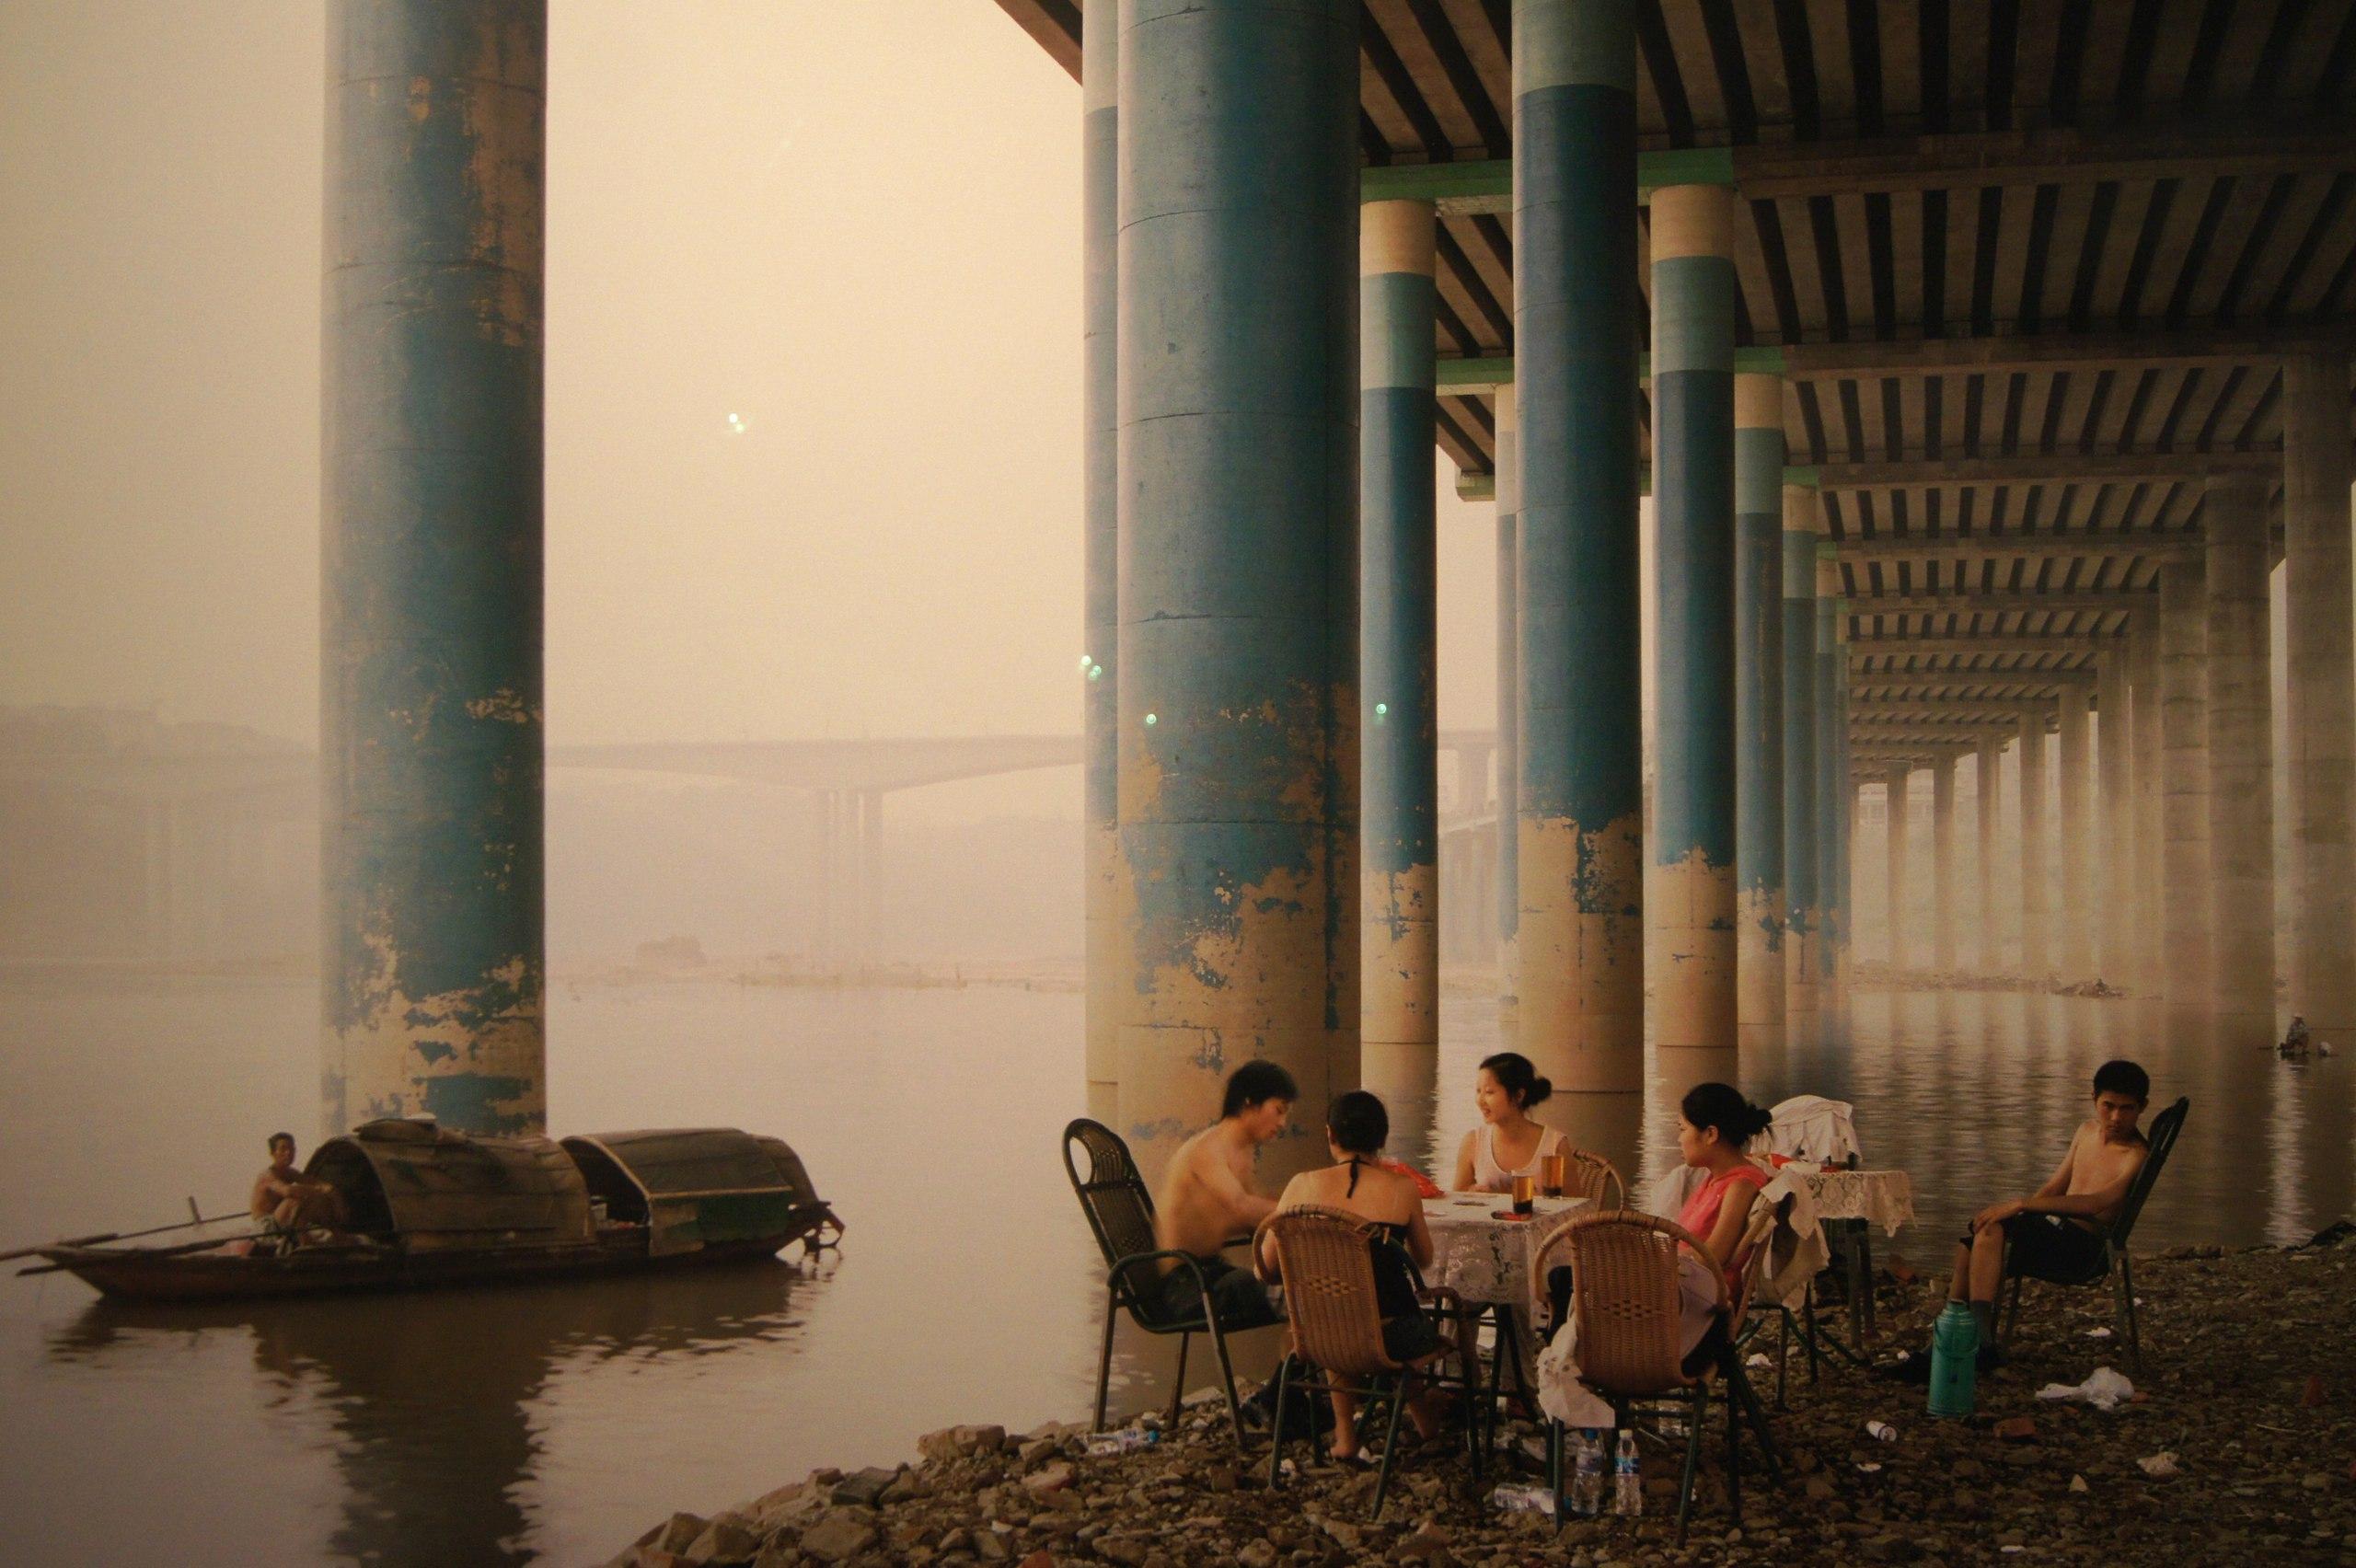 Надав Кандер. Округ Чунцин. 2006. Из серии «Янцзы, длинная река» (2006-2007)